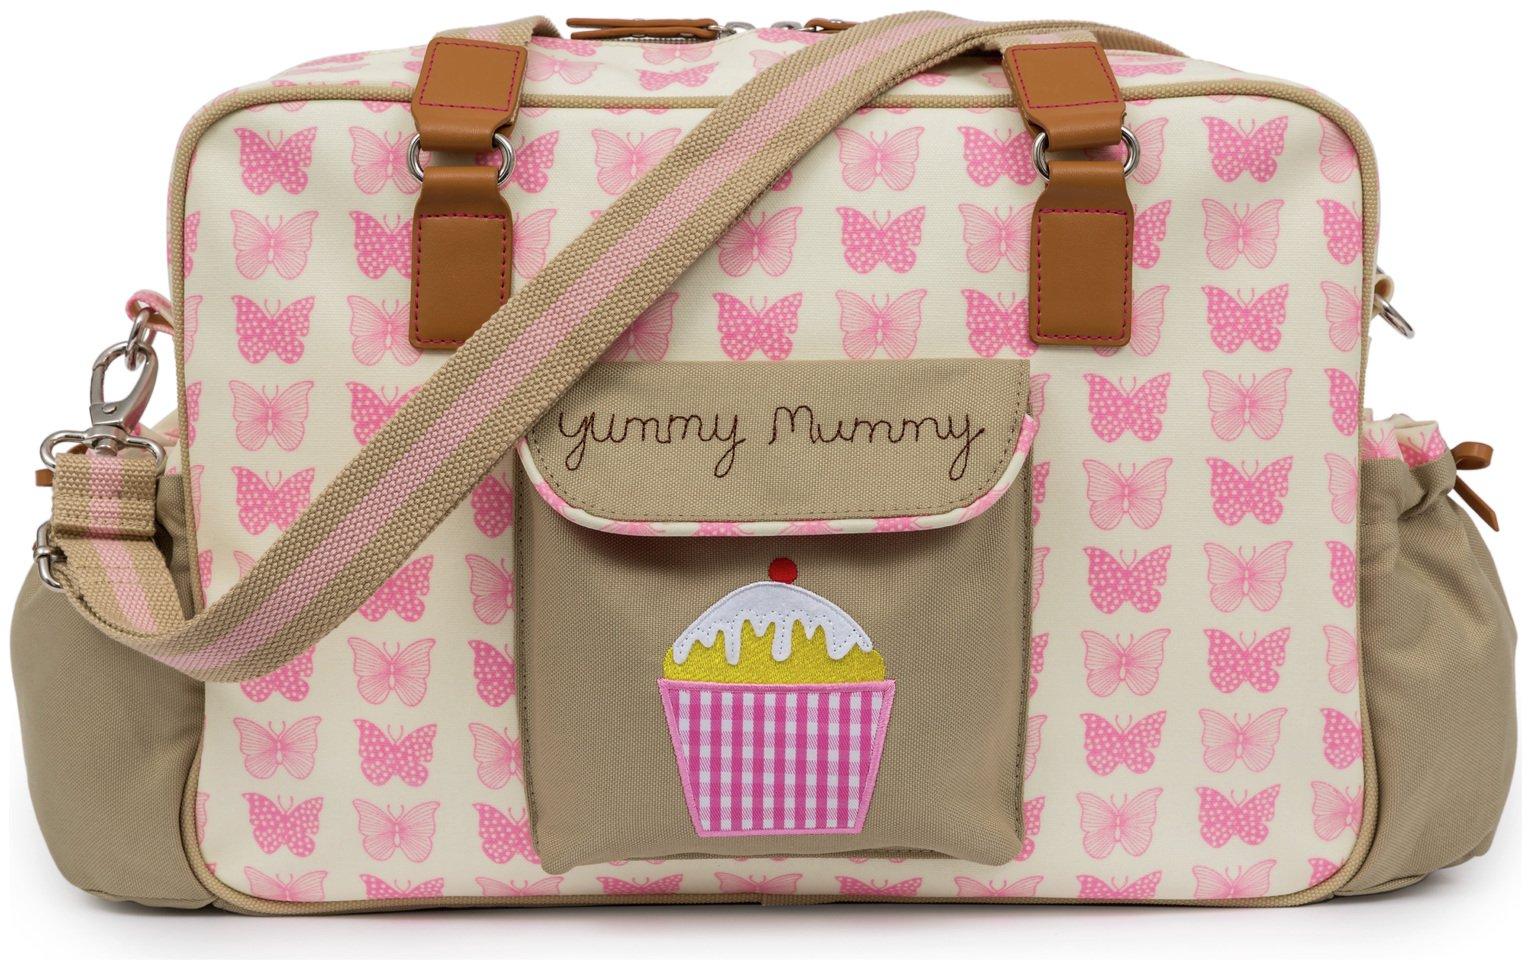 Pink Lining Yummy Mummy Bag - Pink Butterflies